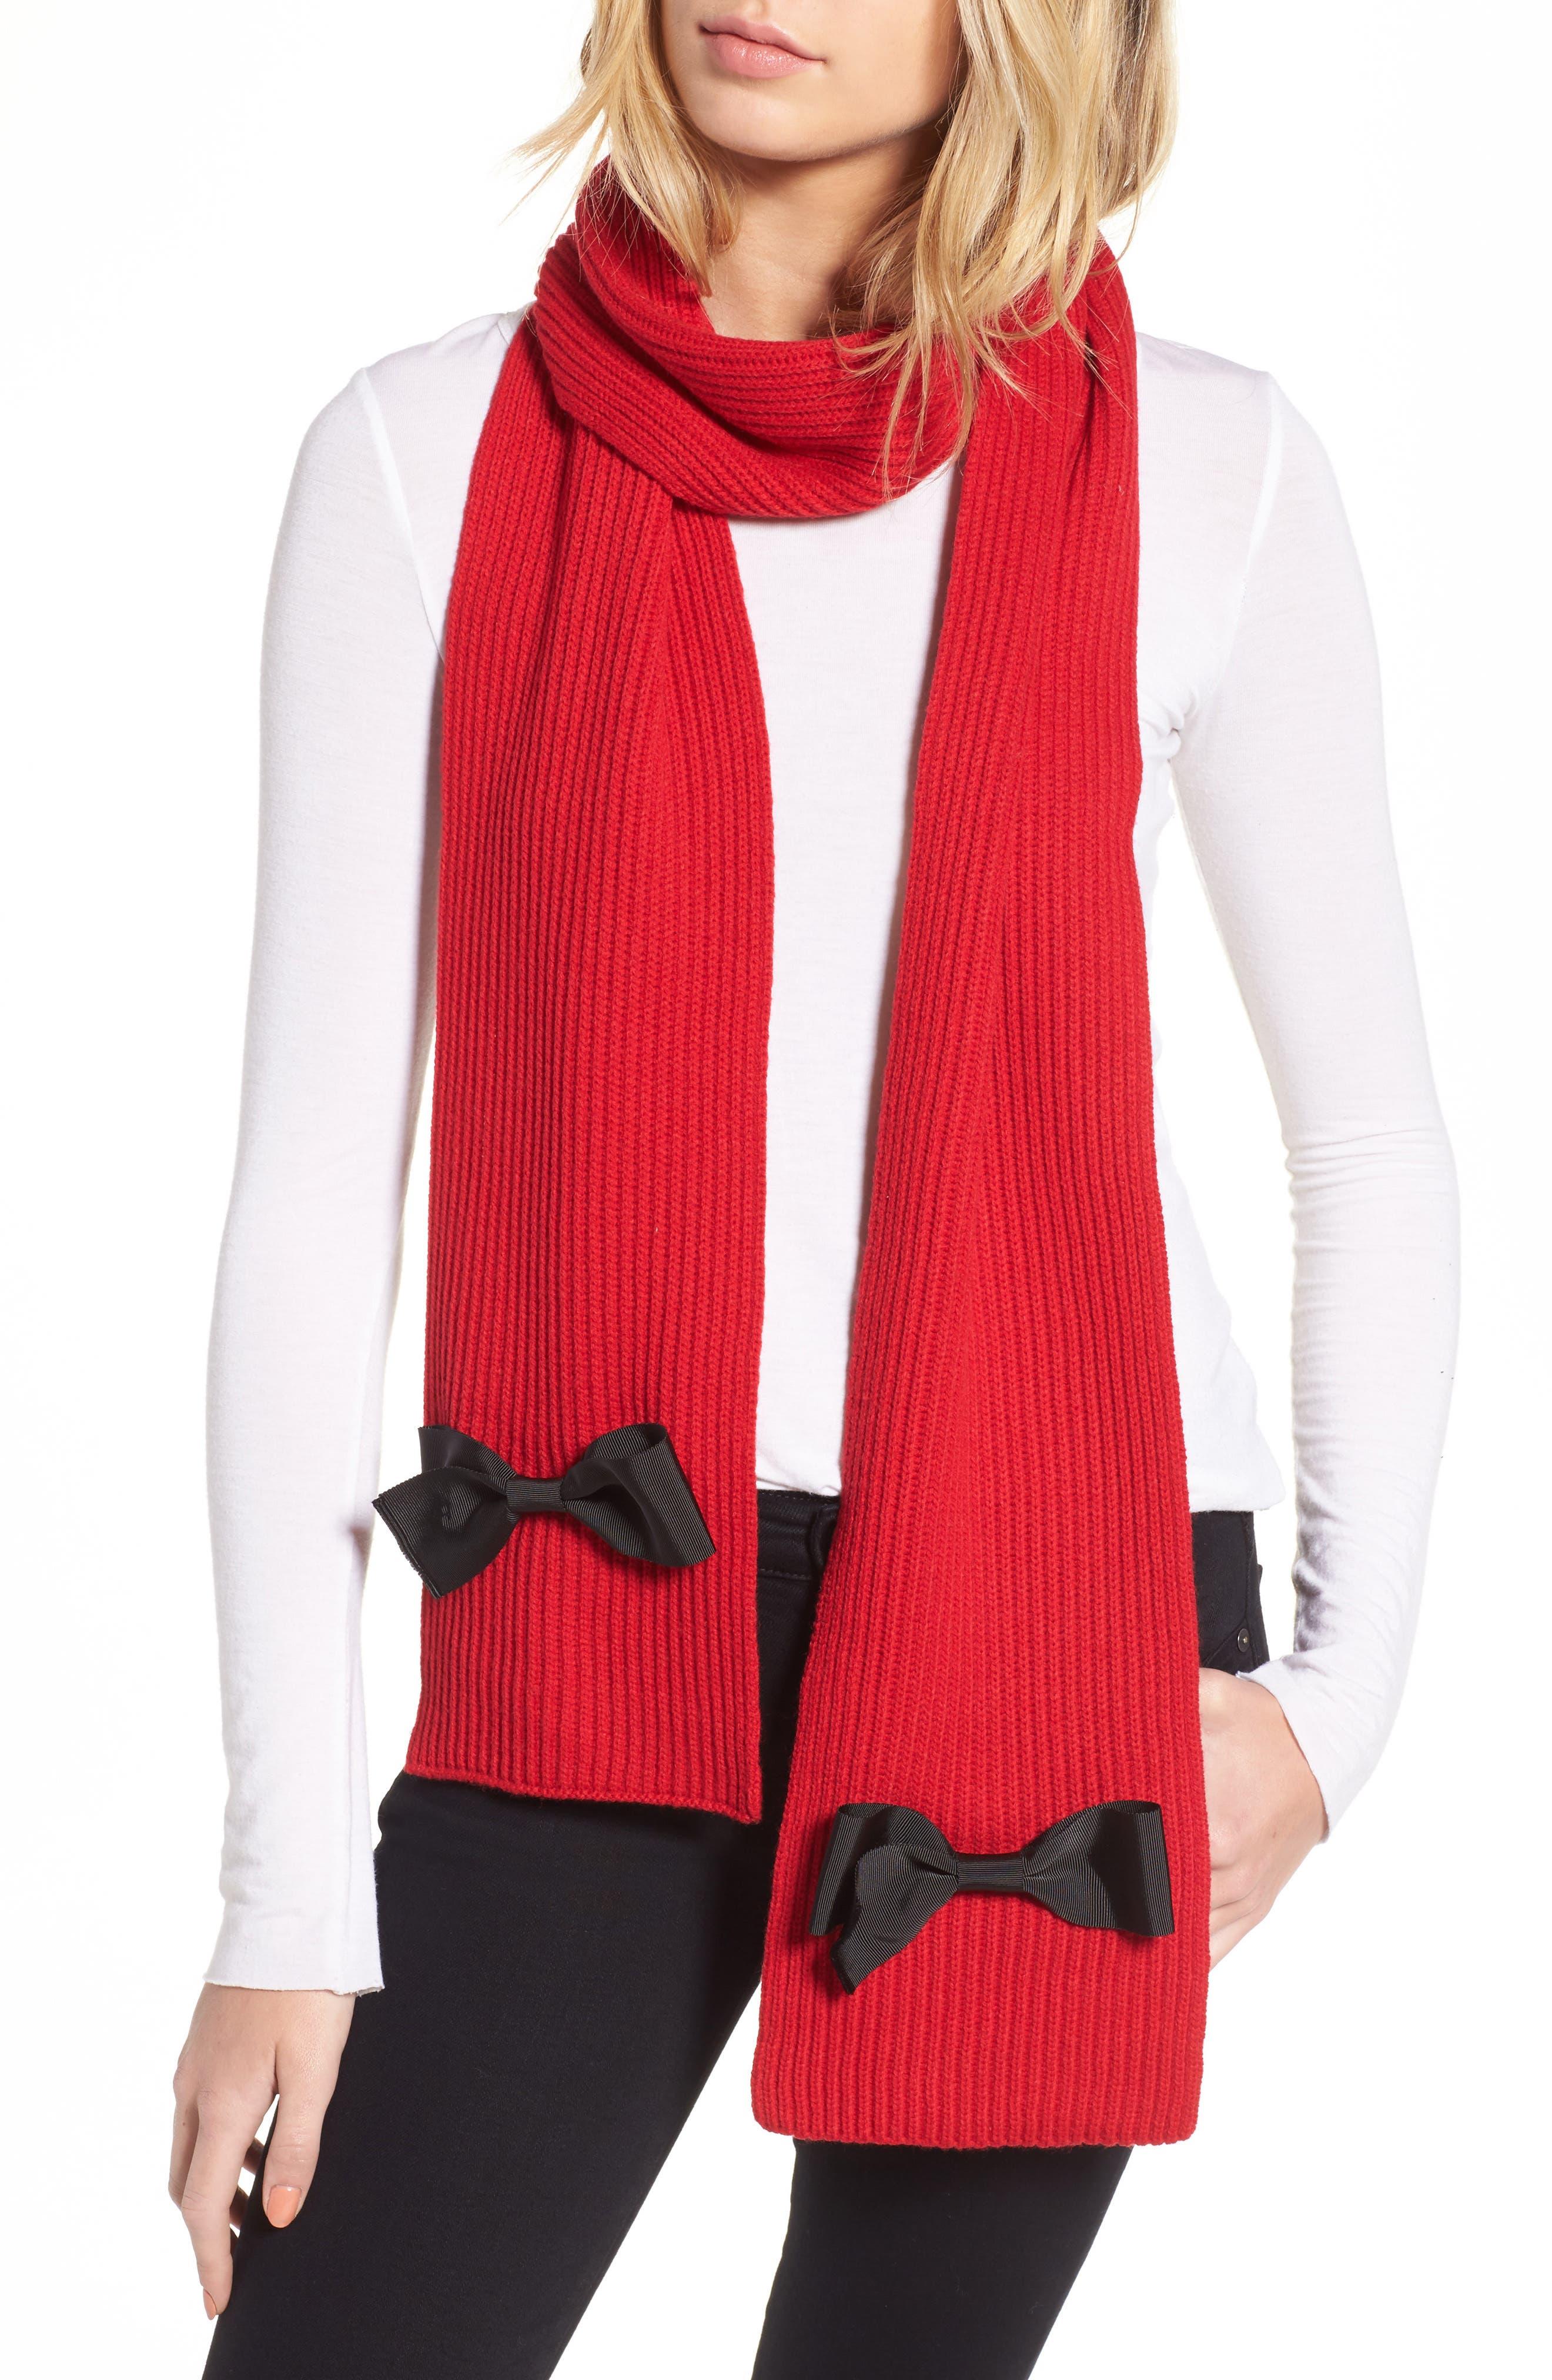 kate spade new york grosgrain bow muffler scarf